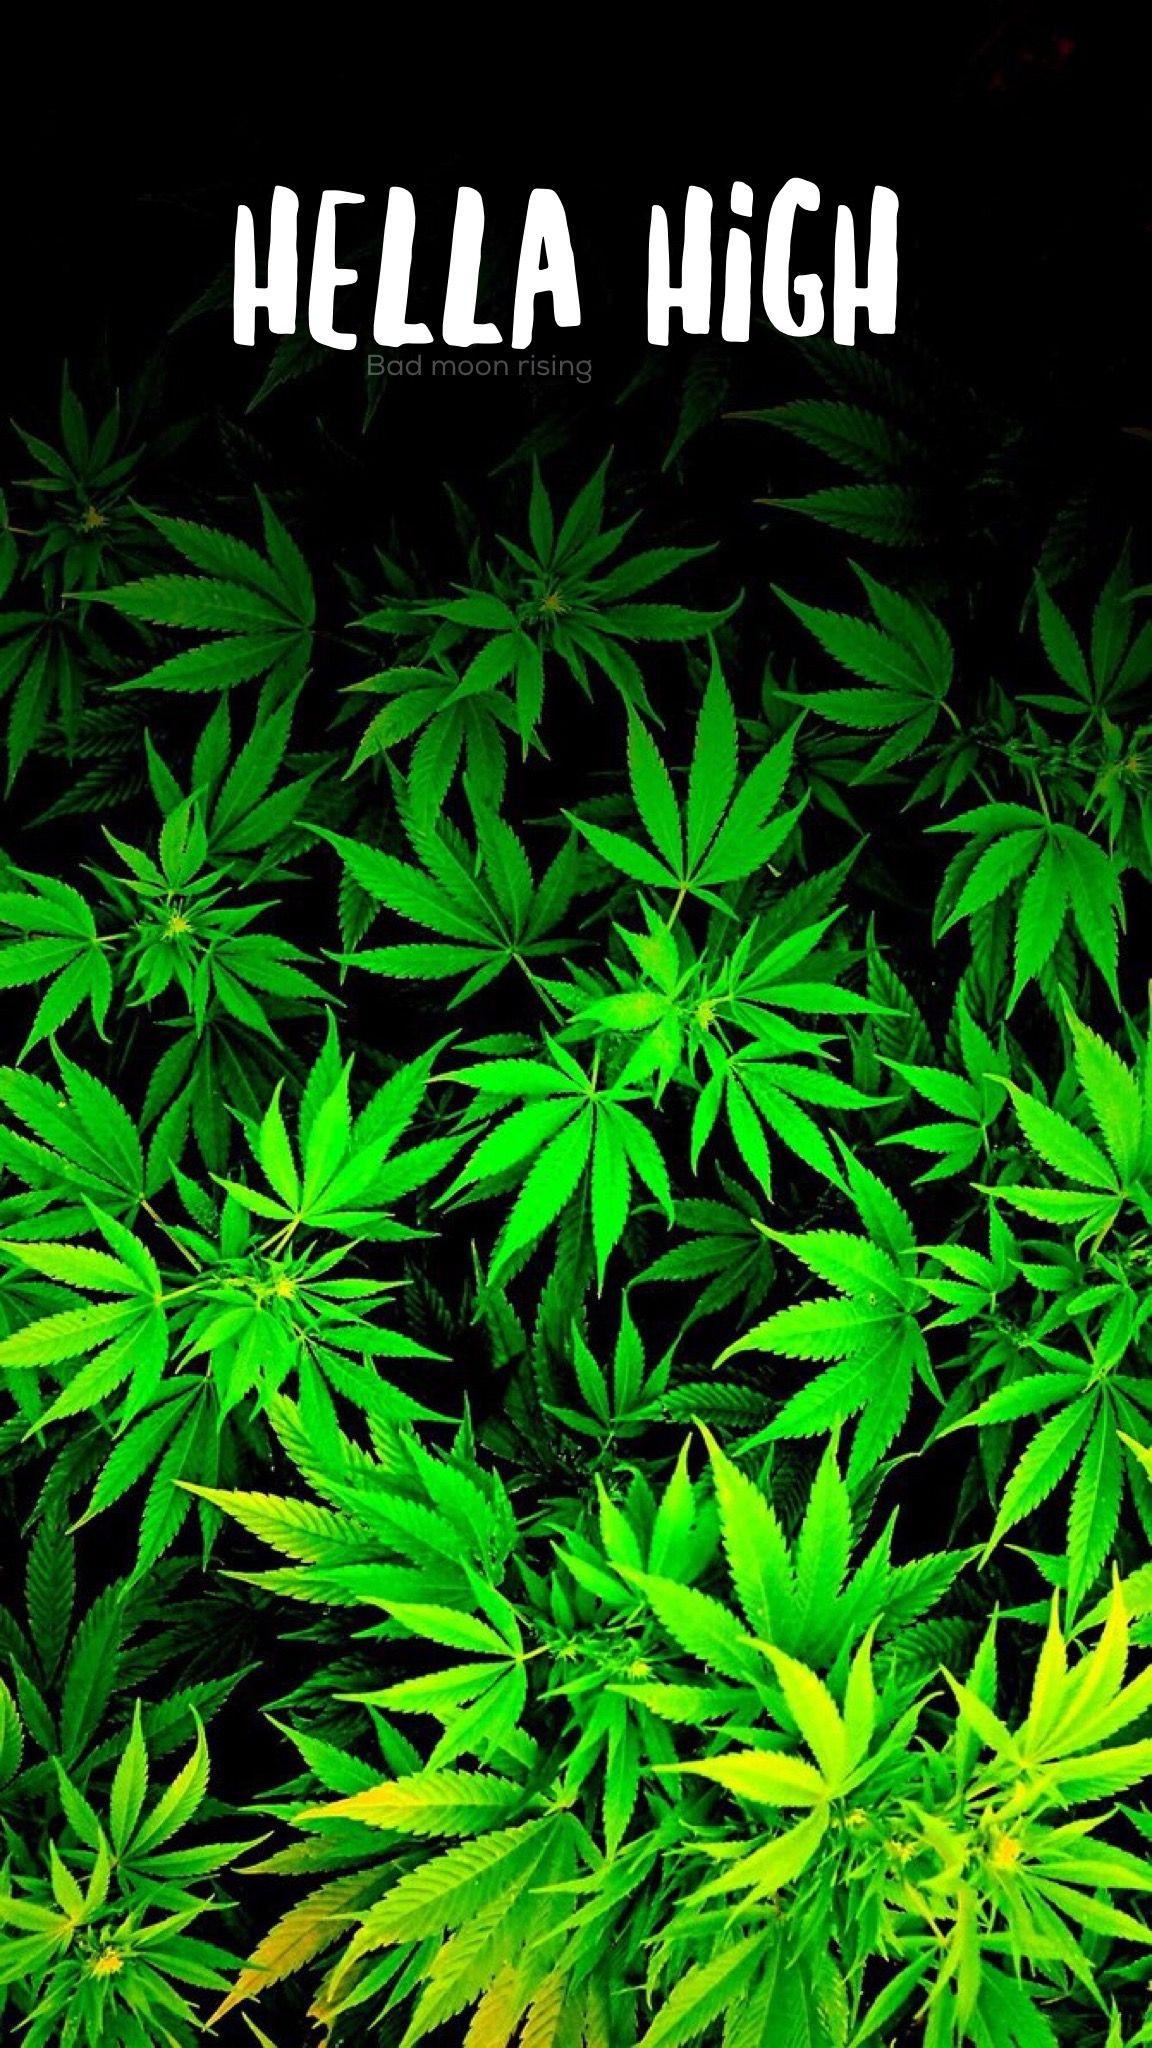 Ganja Wallpaper Iphone Hella High Iphone Wallpaper Background Stoner Marijuana